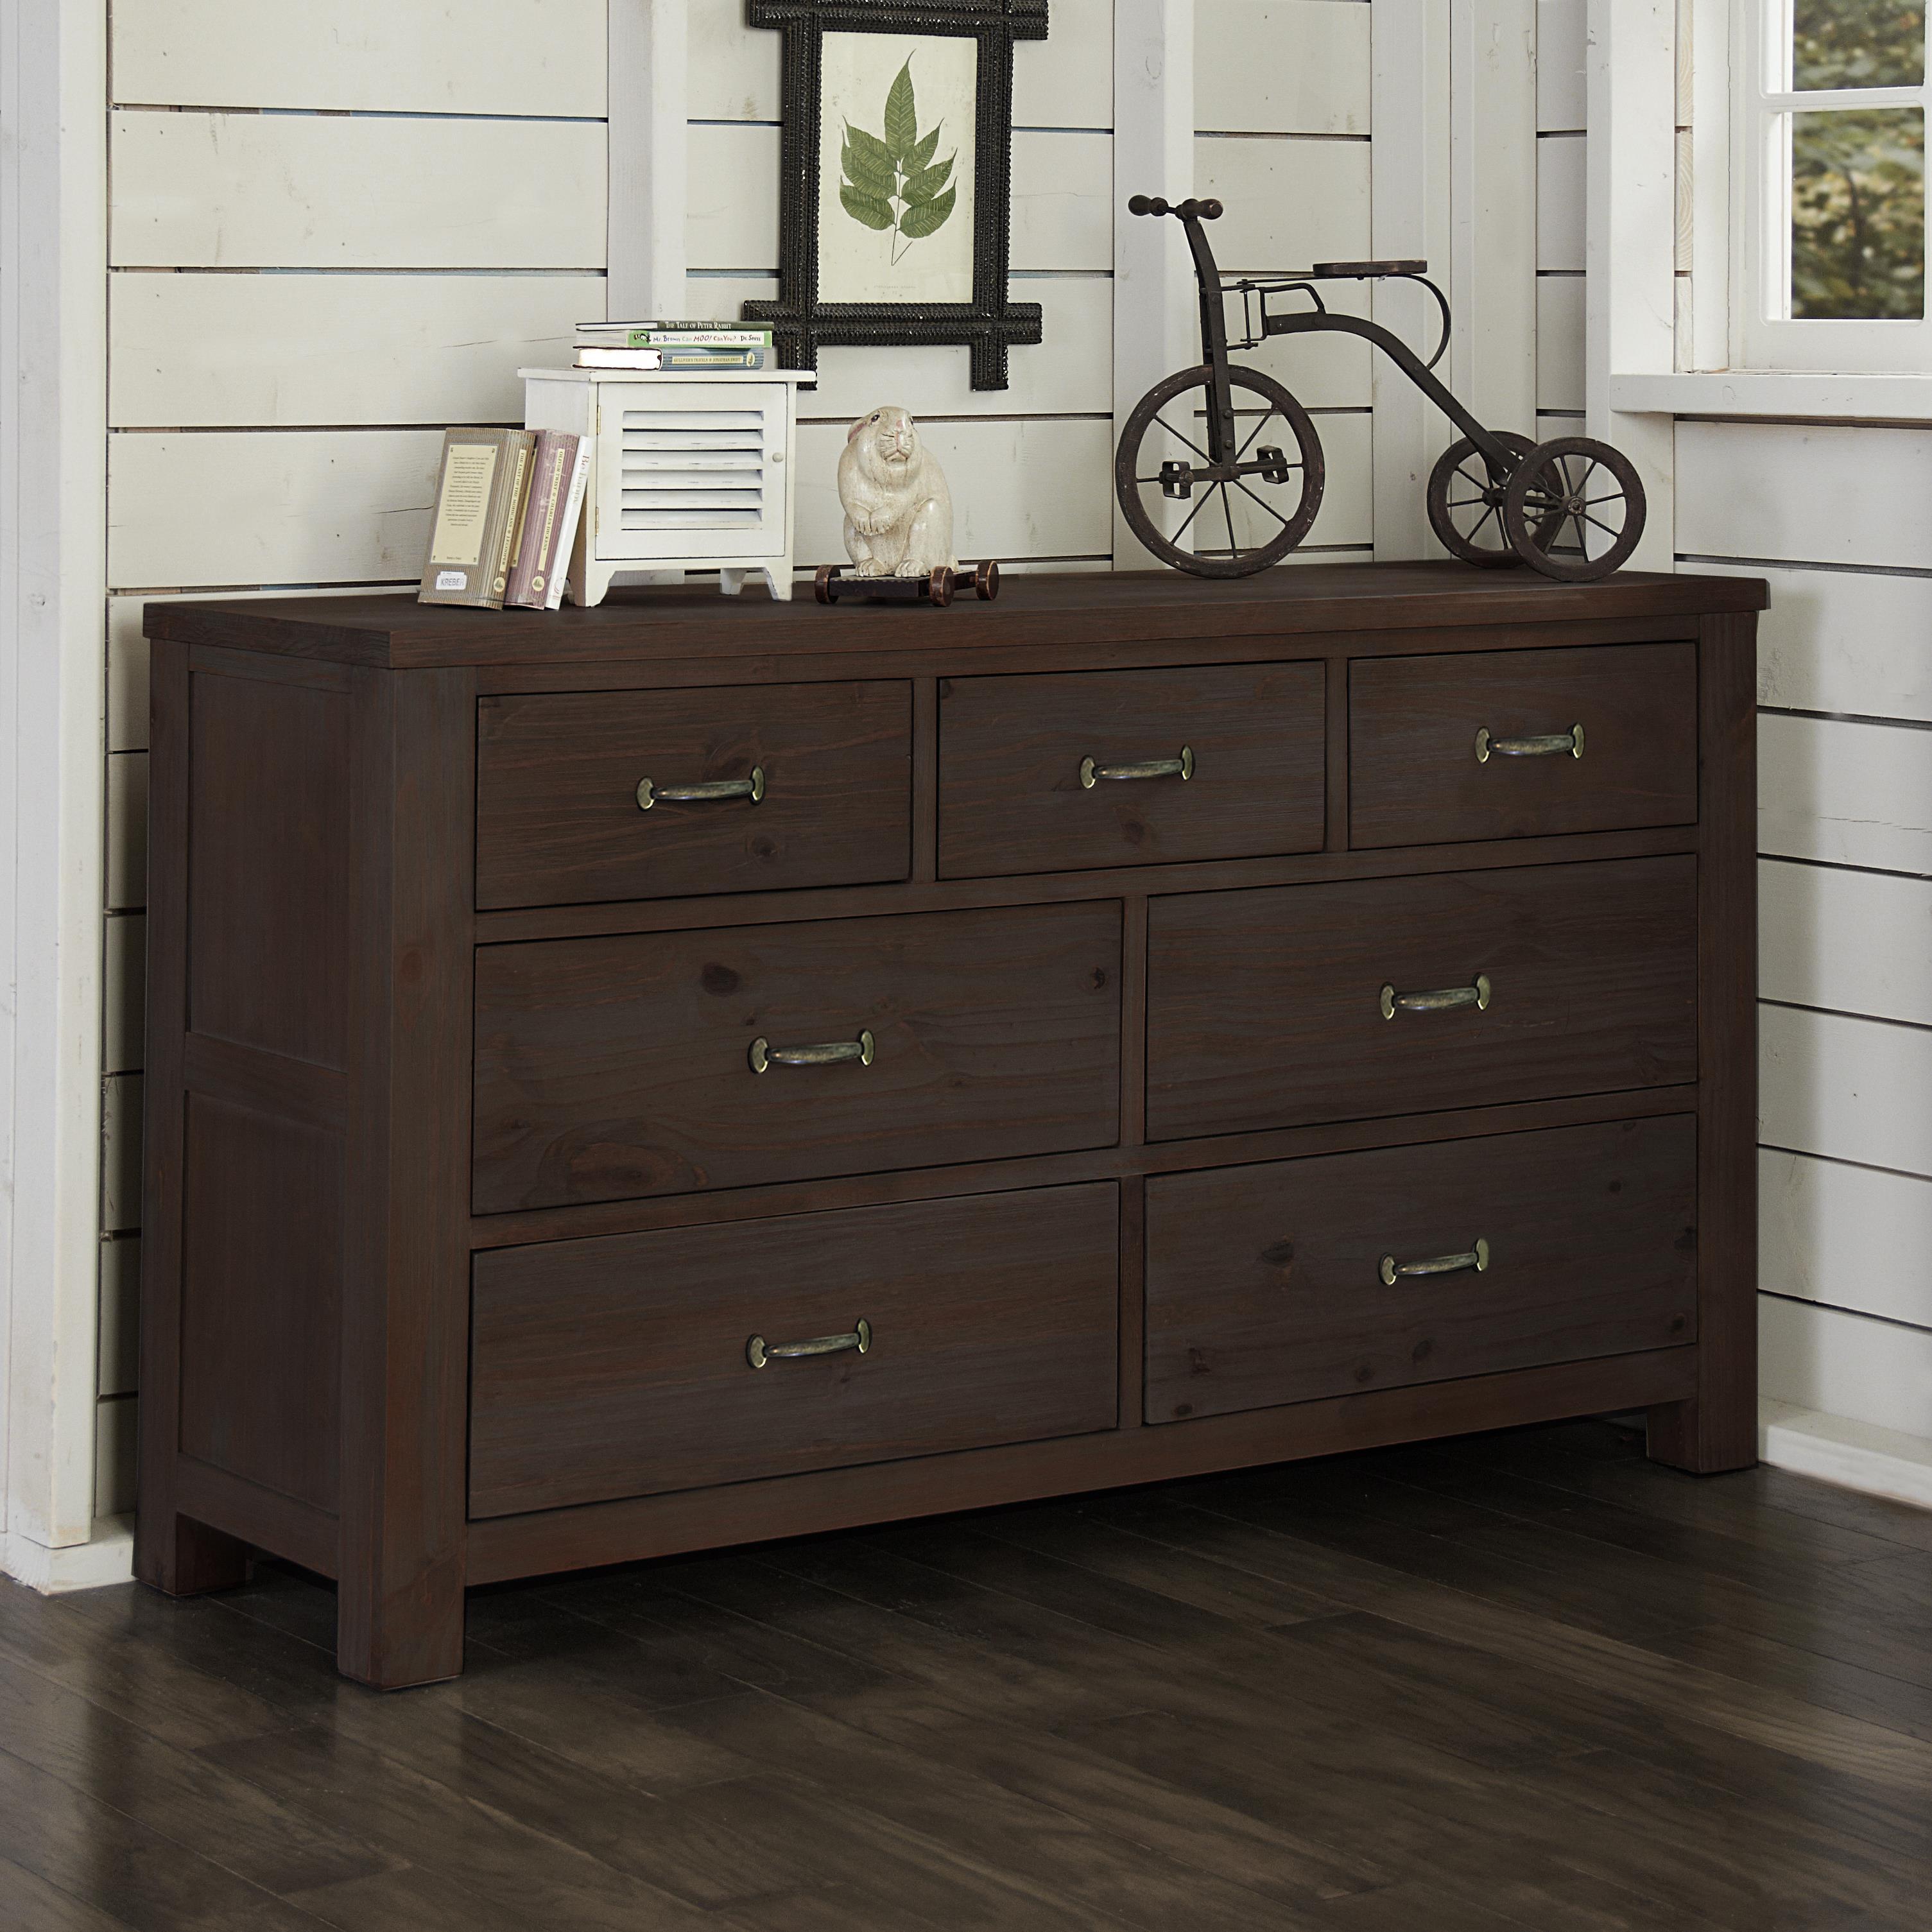 Highlands Dresser by NE Kids at Stoney Creek Furniture